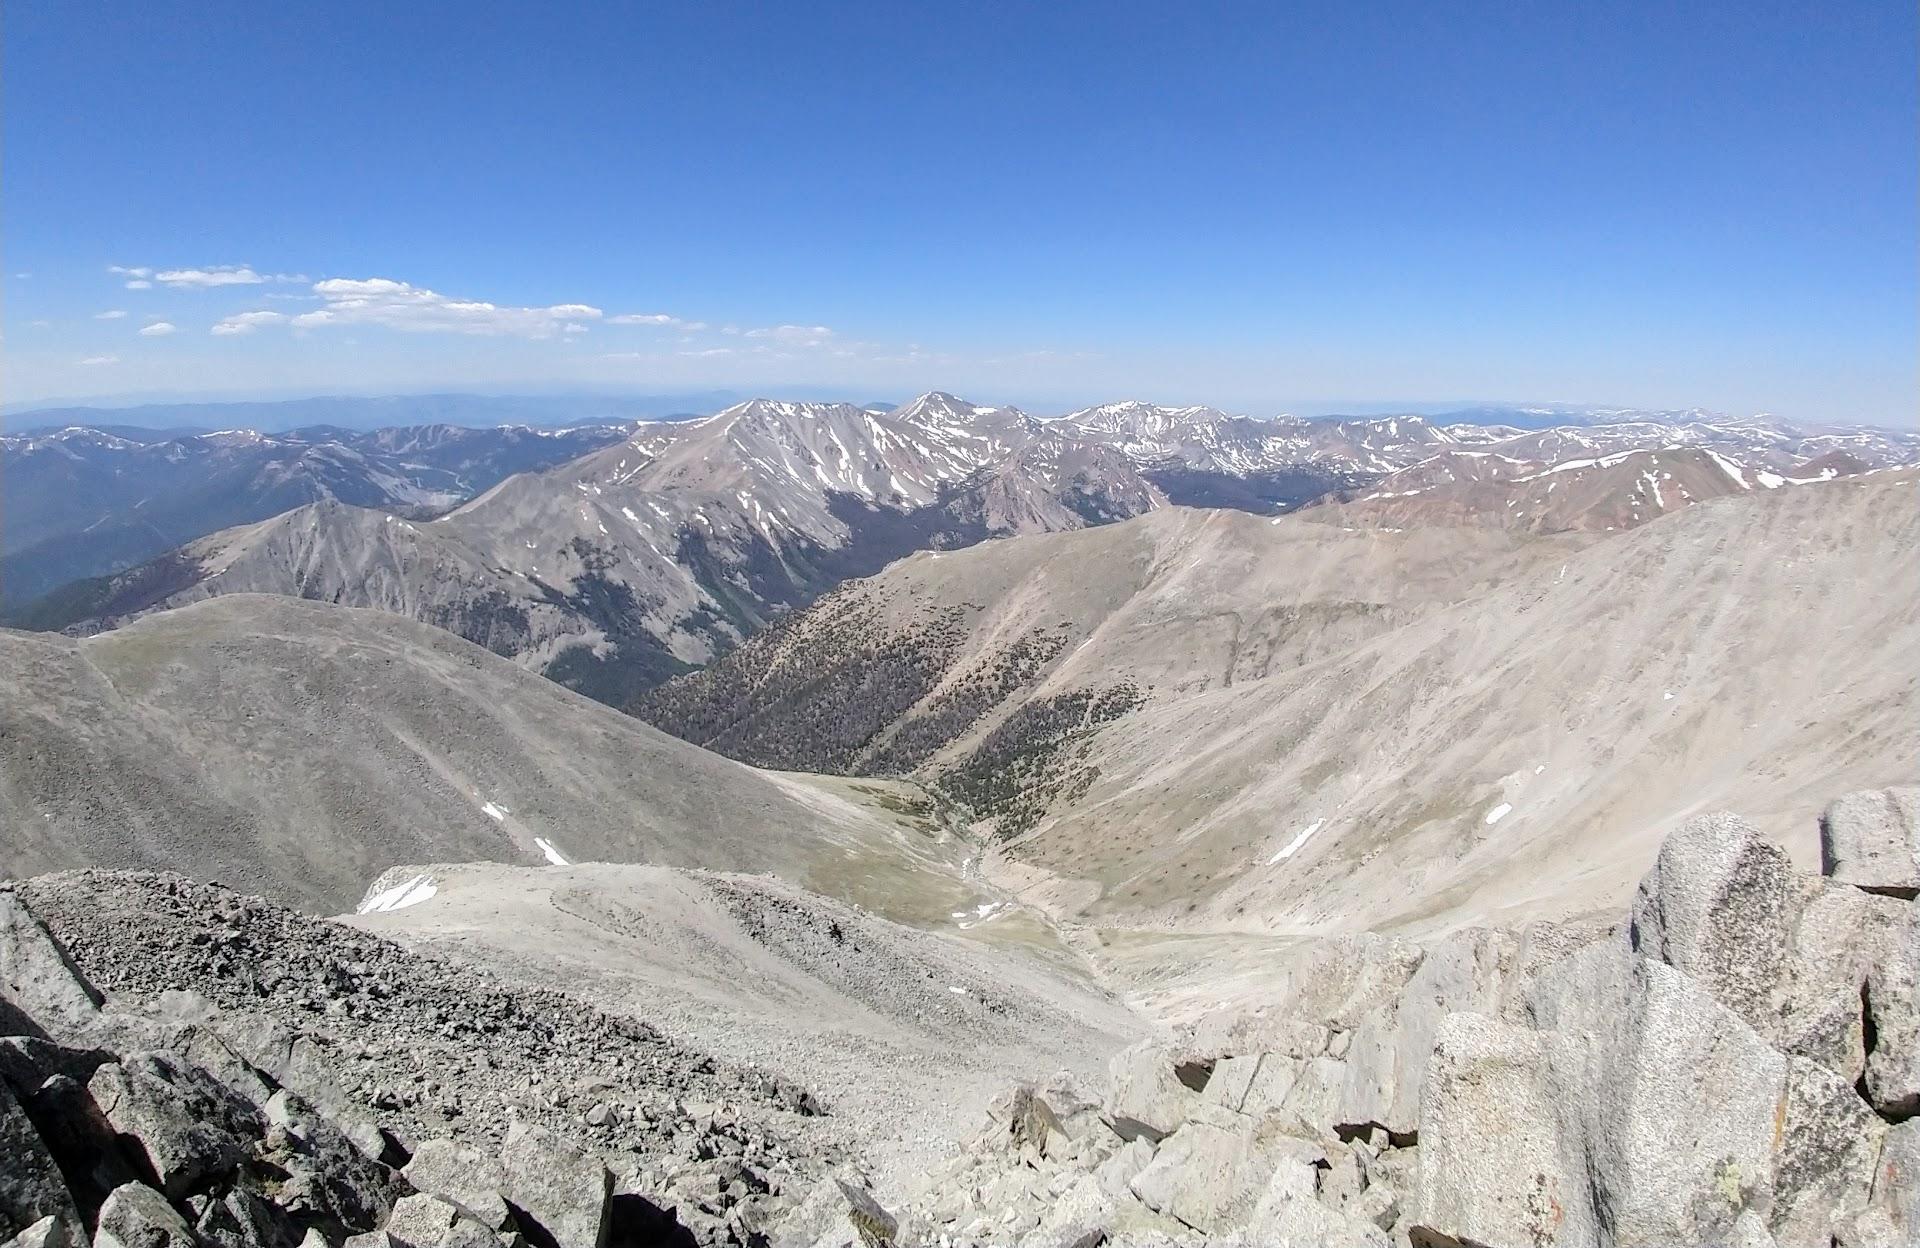 More summit views!